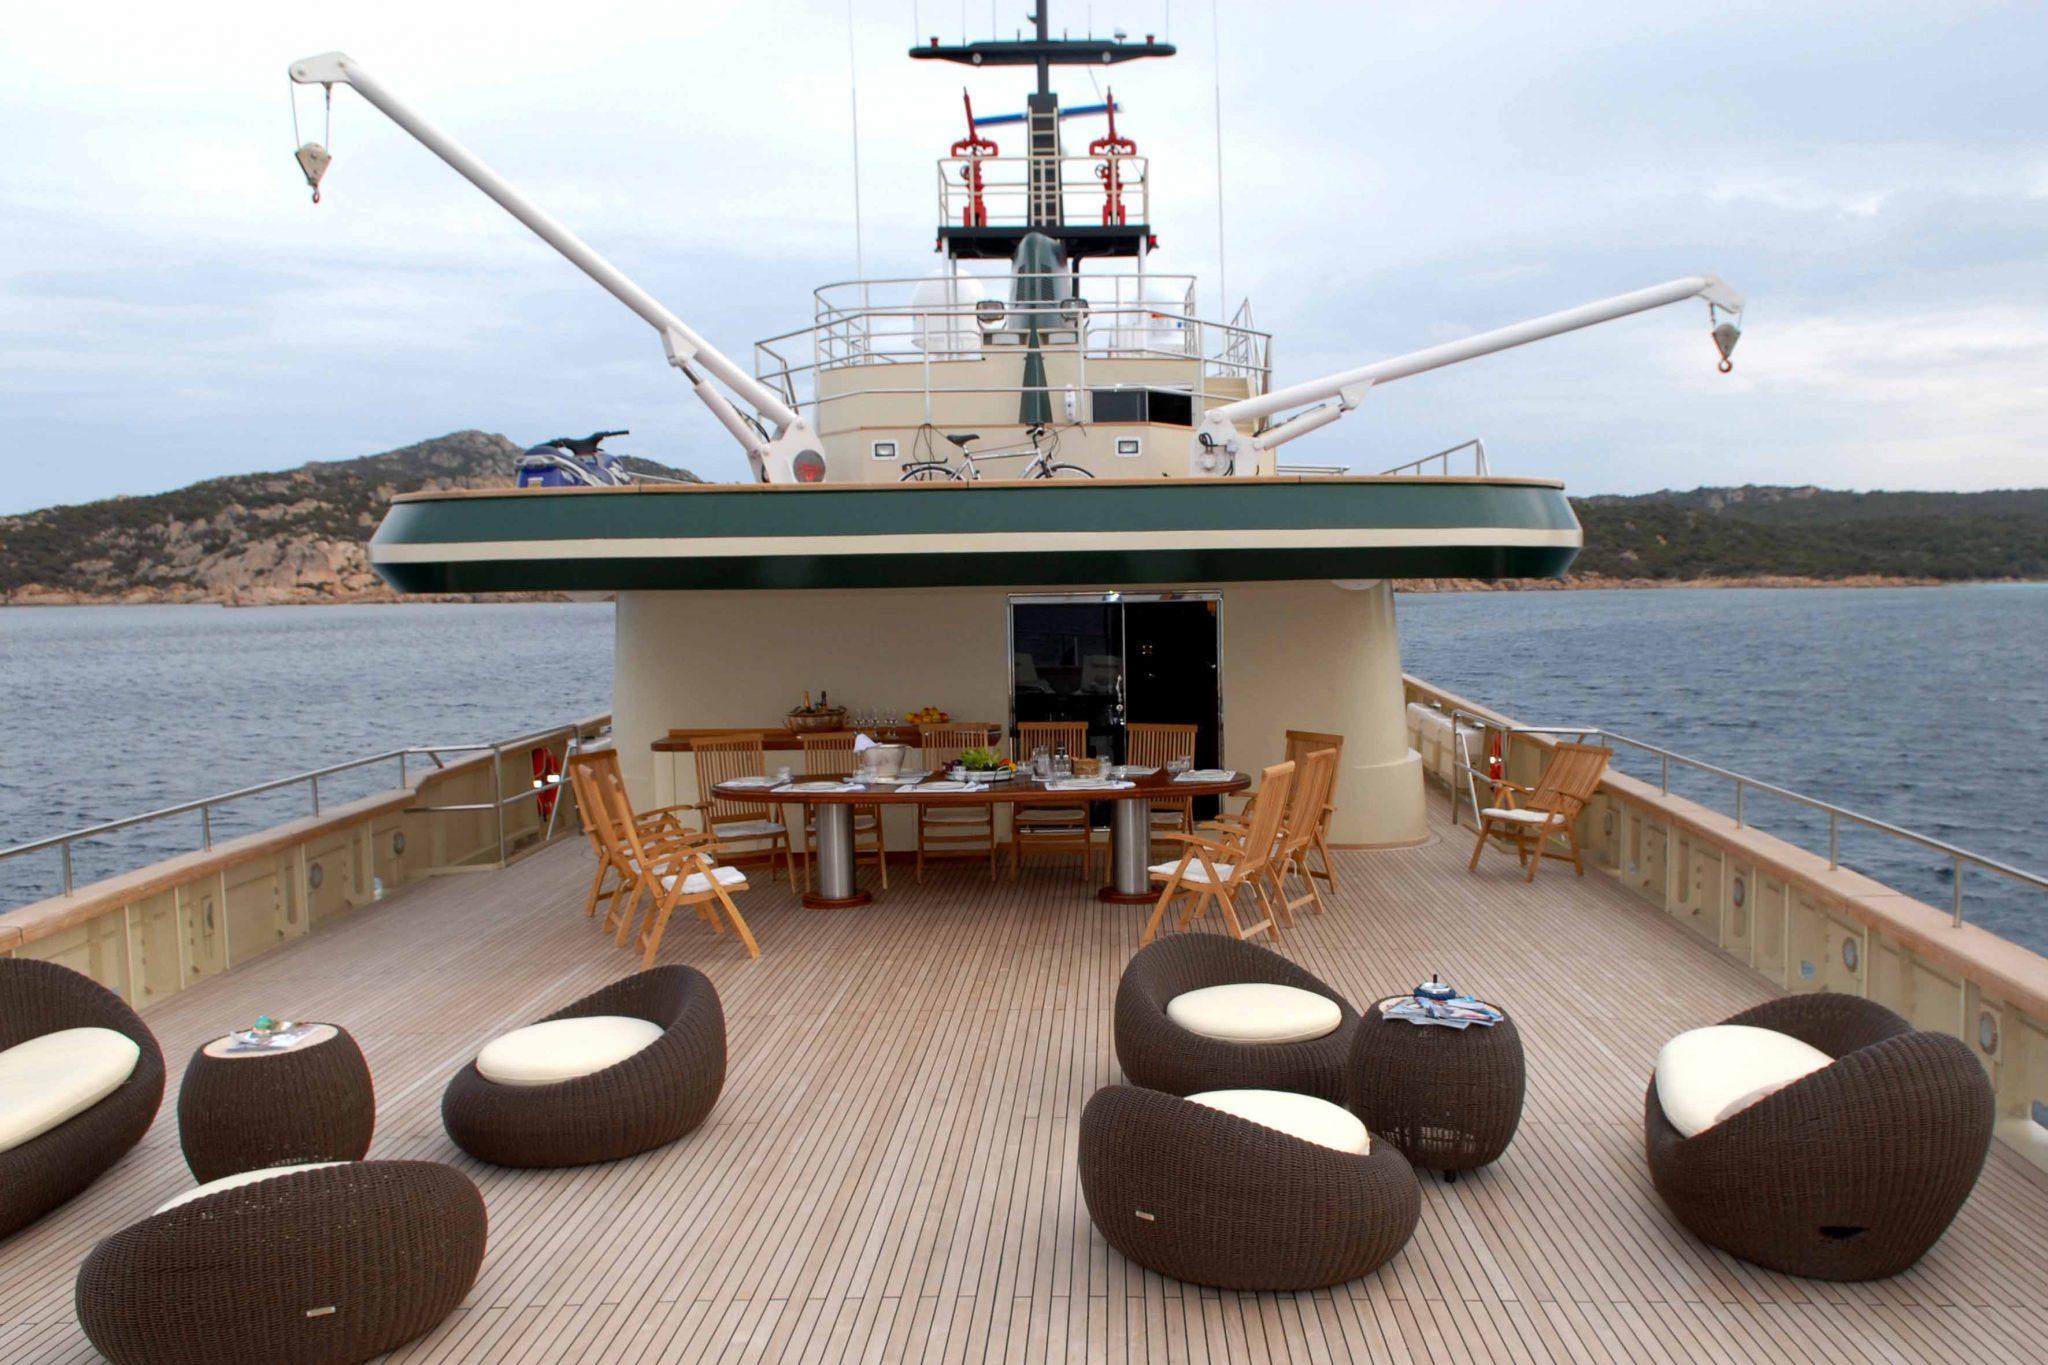 Ariete Primo luxry yacht broker